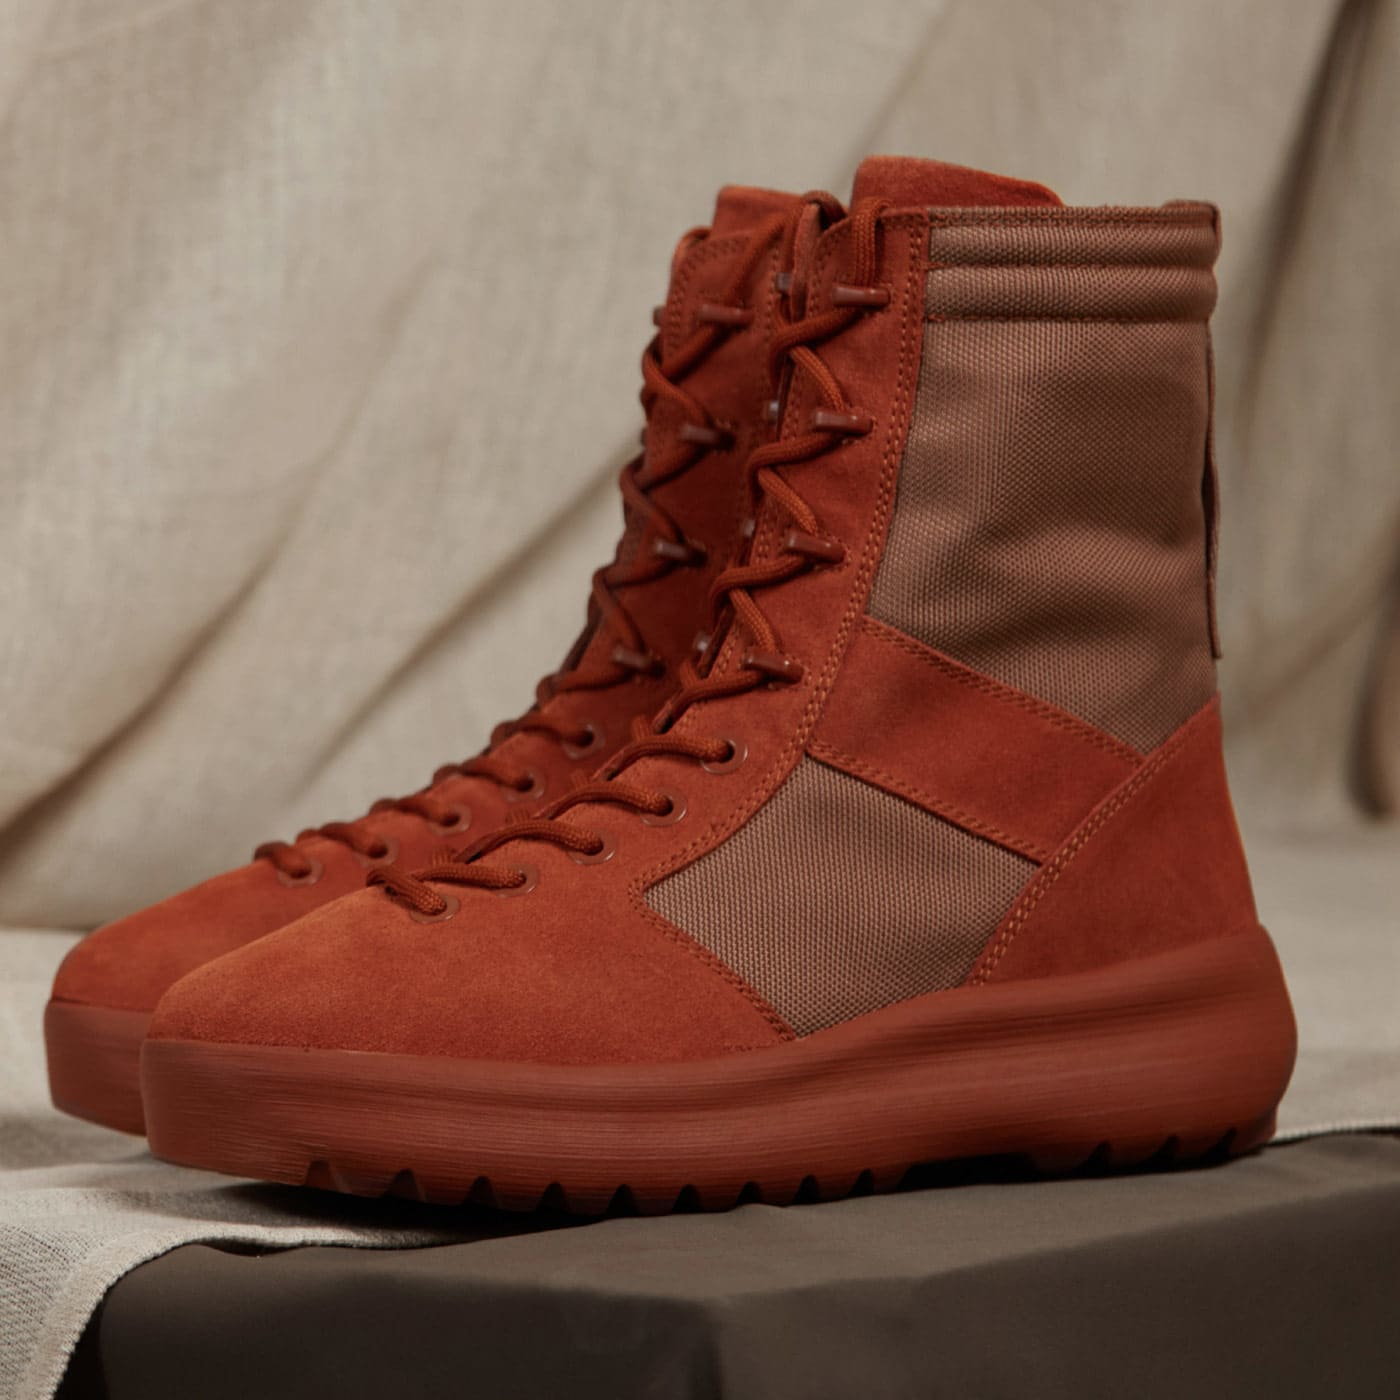 93c6c4e17 Yeezy Season 3 Military Boot Burnt Sienna